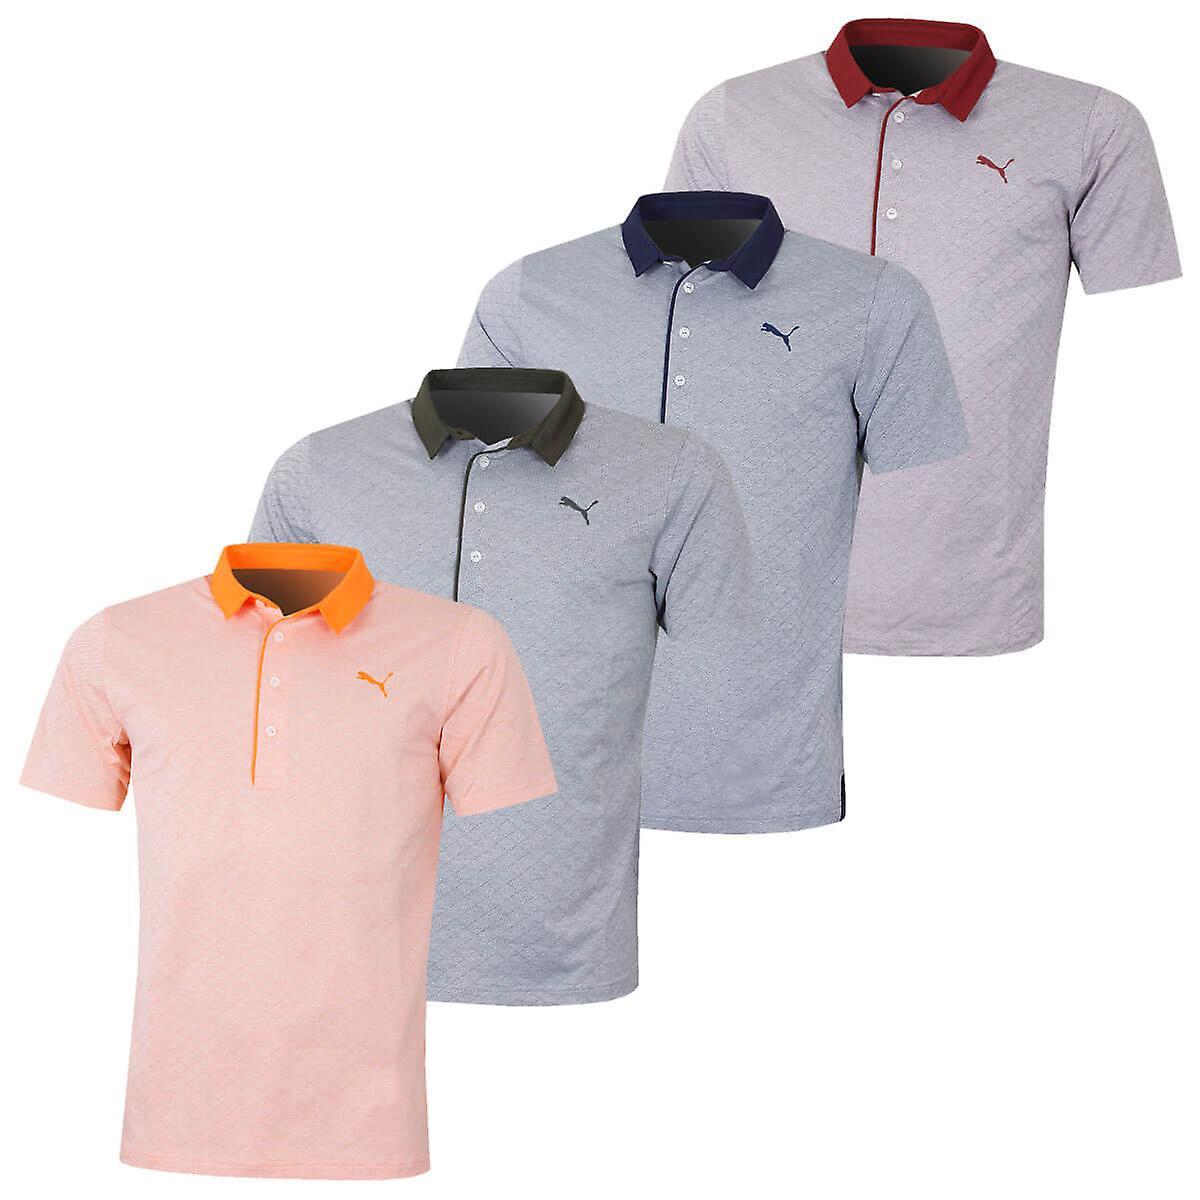 aa2bfbd84e Puma Golf Mens Diamond Jacquard Golf Polo Shirt